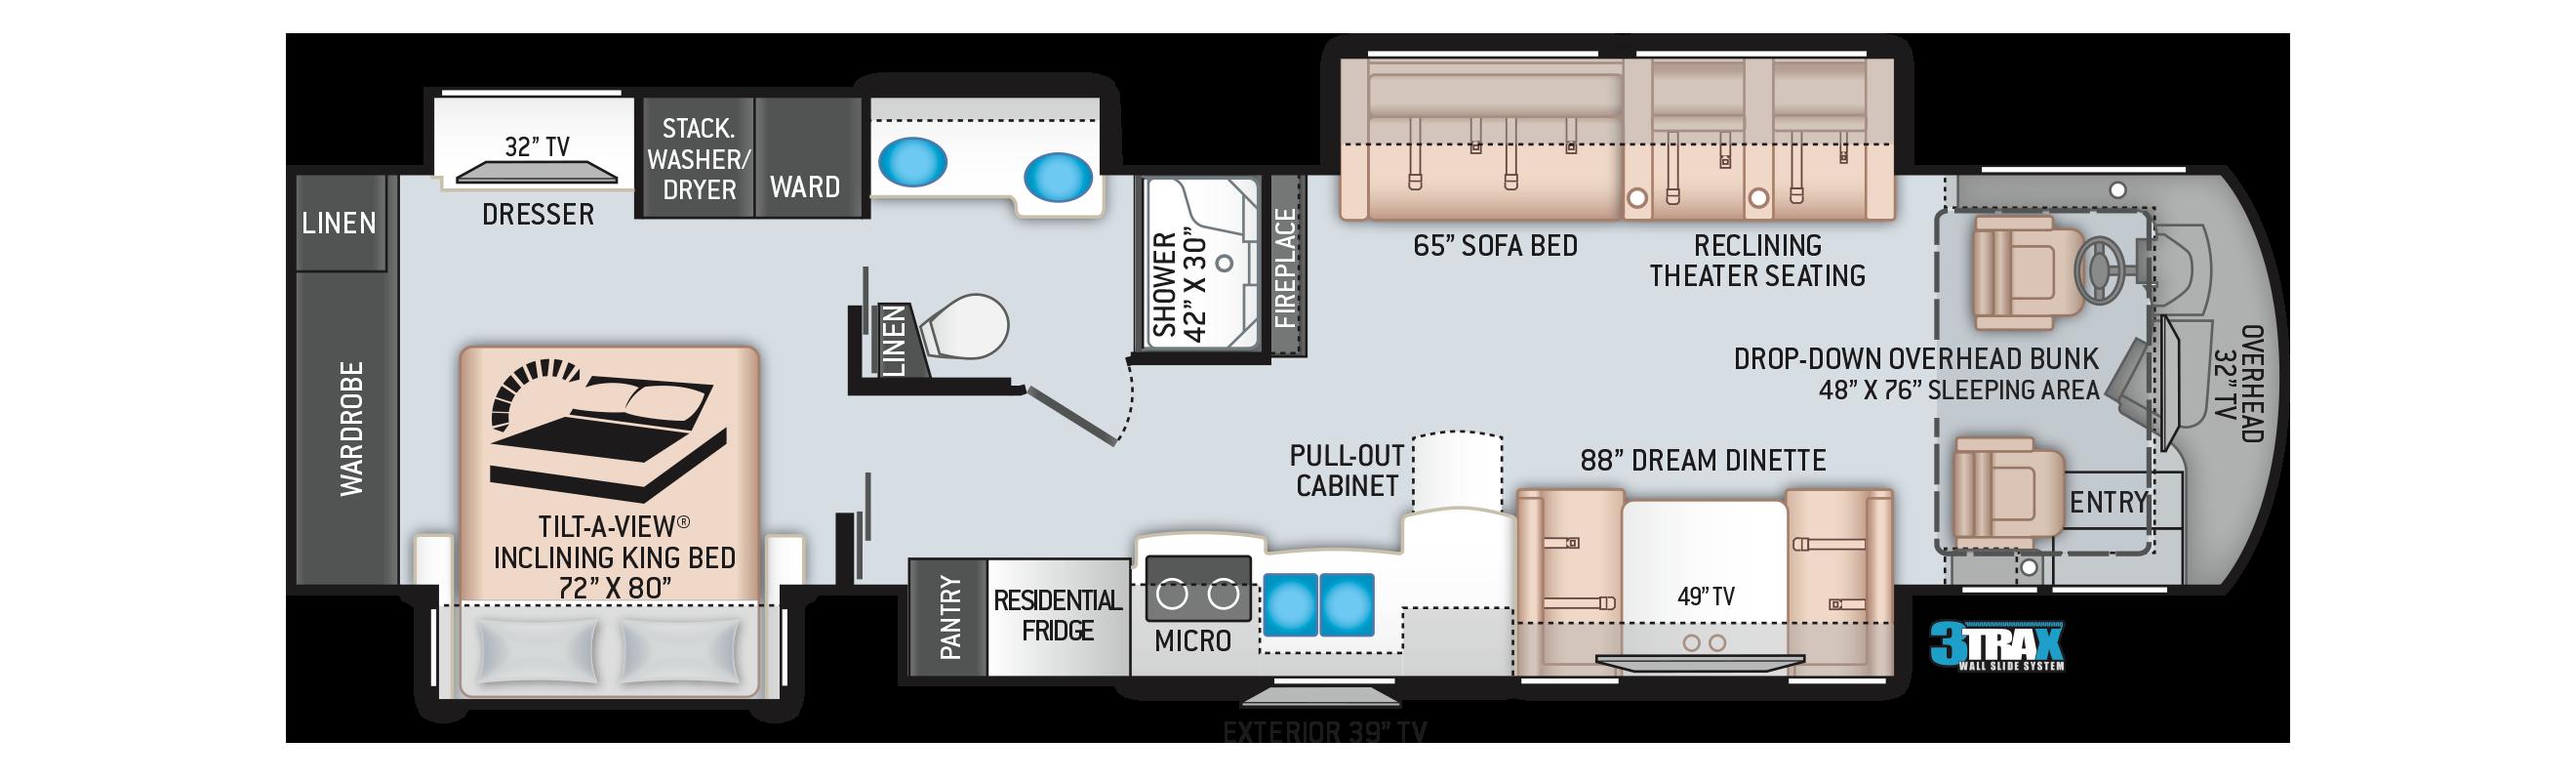 Aria Class A Diesel Motorhome 3902 Floor Plan